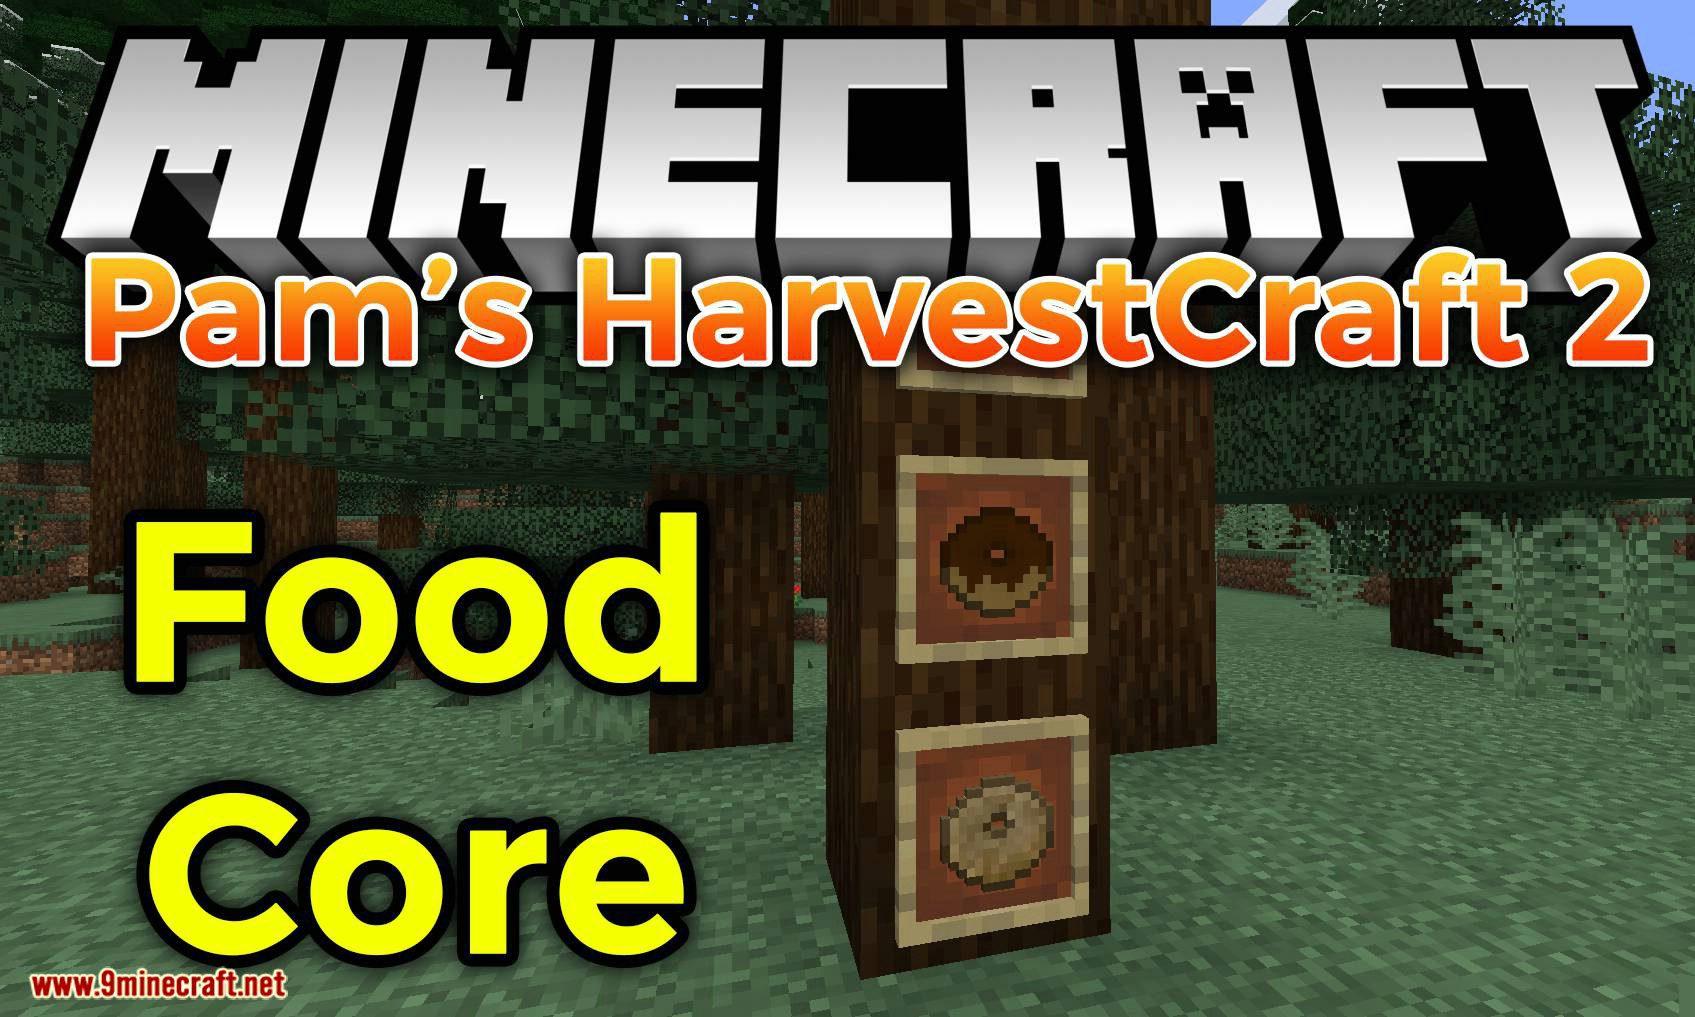 Pam_s HarvestCraft 2 Food Core mod for minecraft logo